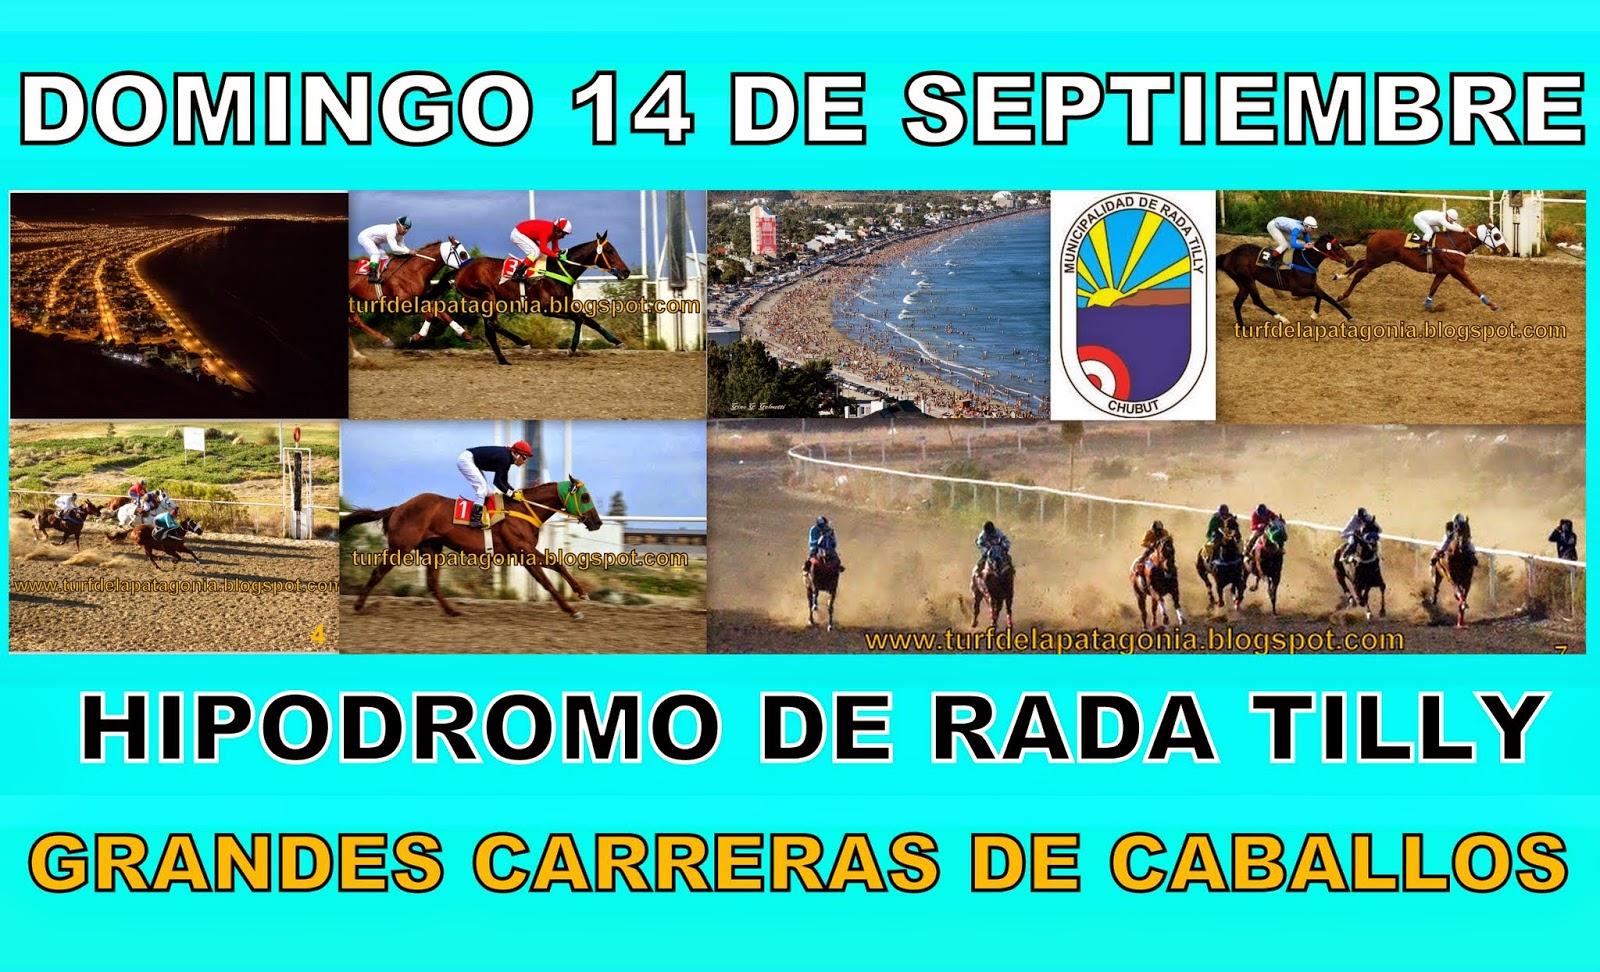 http://turfdelapatagonia.blogspot.com.ar/2014/08/1409-carreras-de-caballos-en-rada-tilly.html